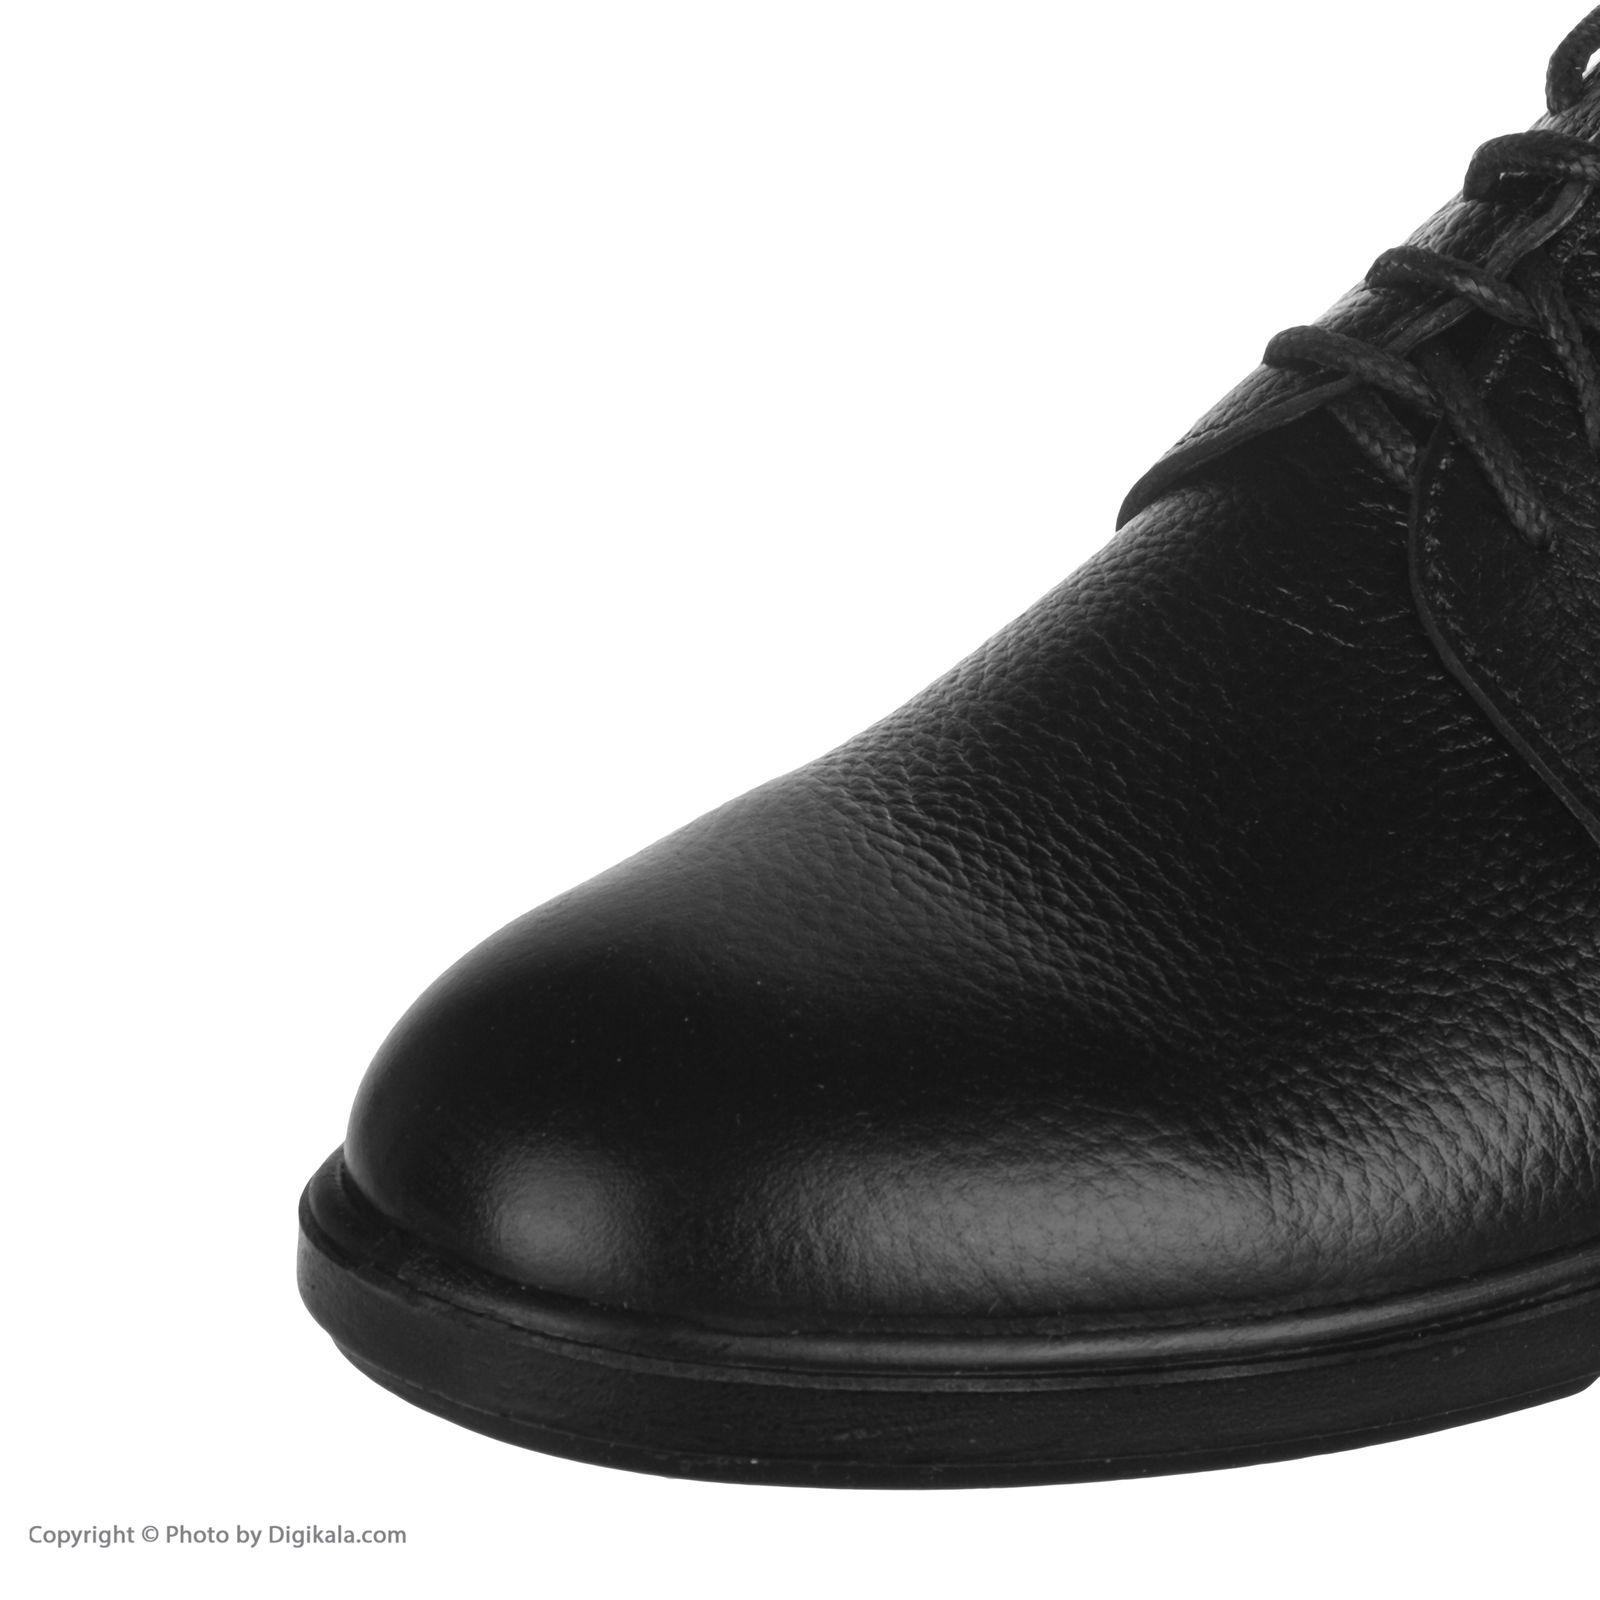 کفش روزمره مردانه آذر پلاس مدل 9438B503101 -  - 8